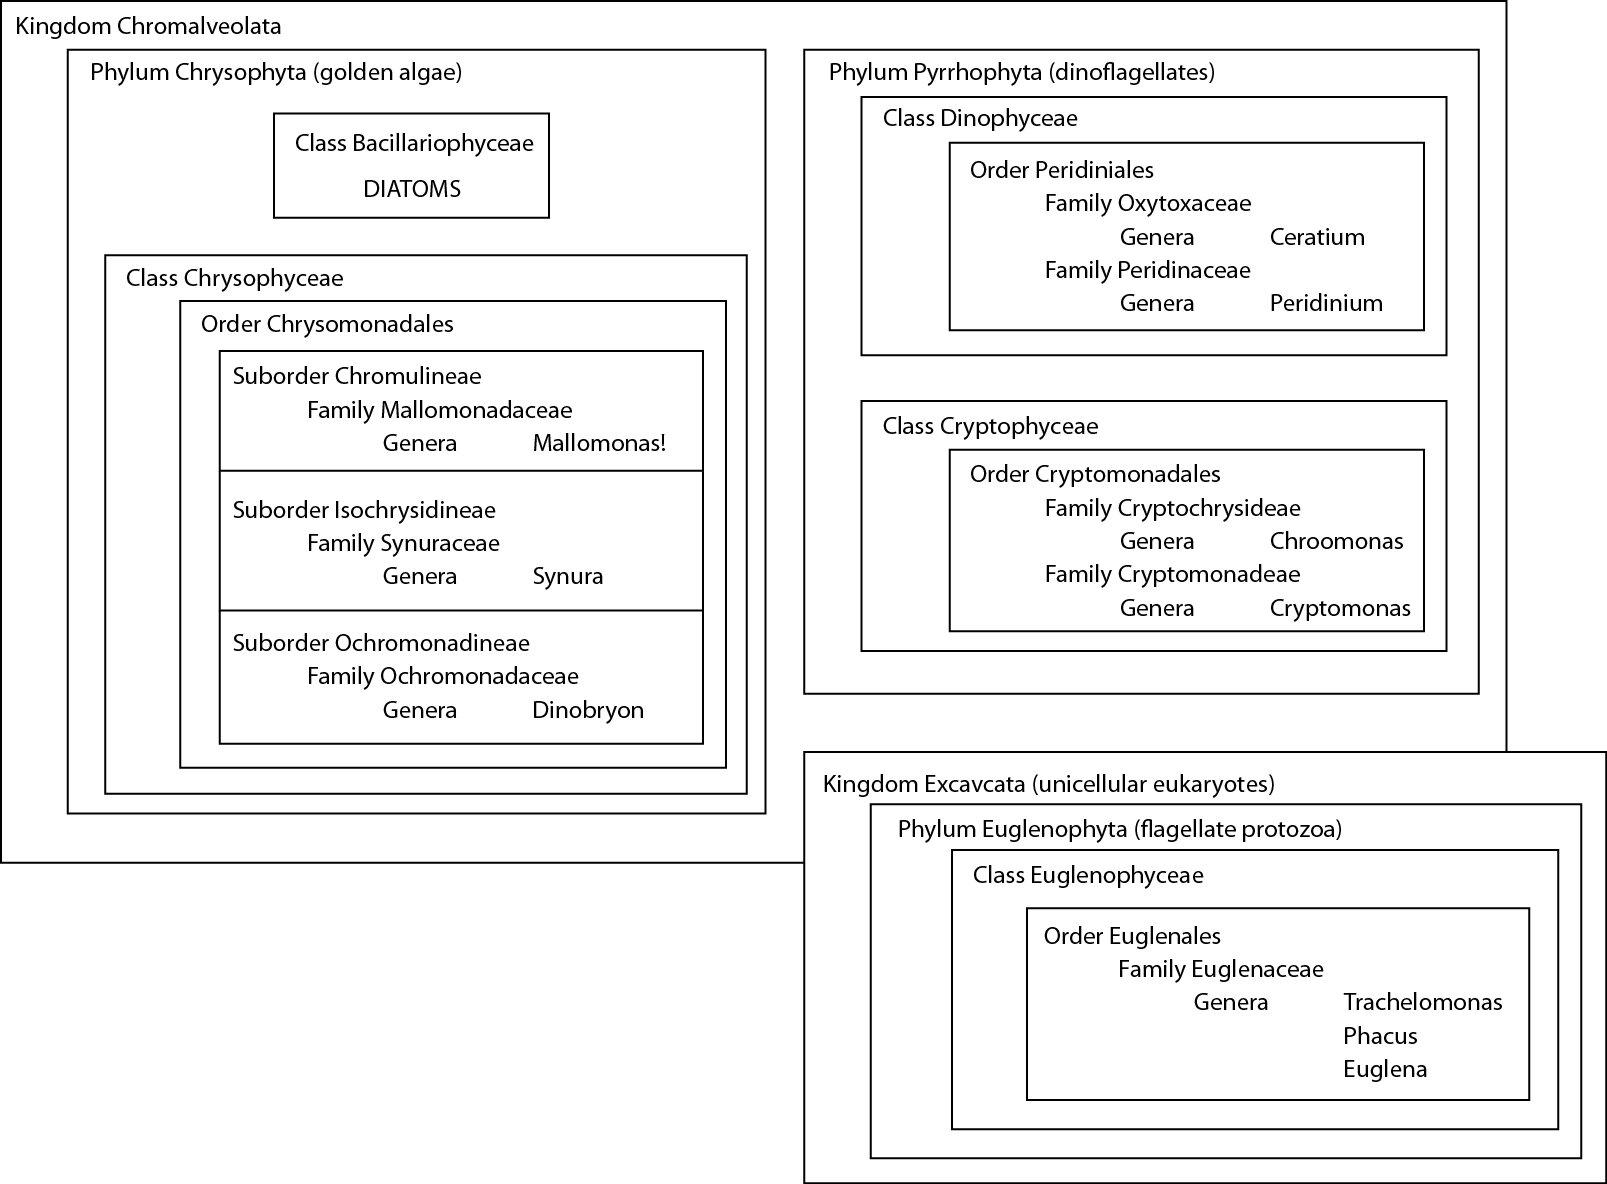 Taxonomy diagram of different phytoplankton